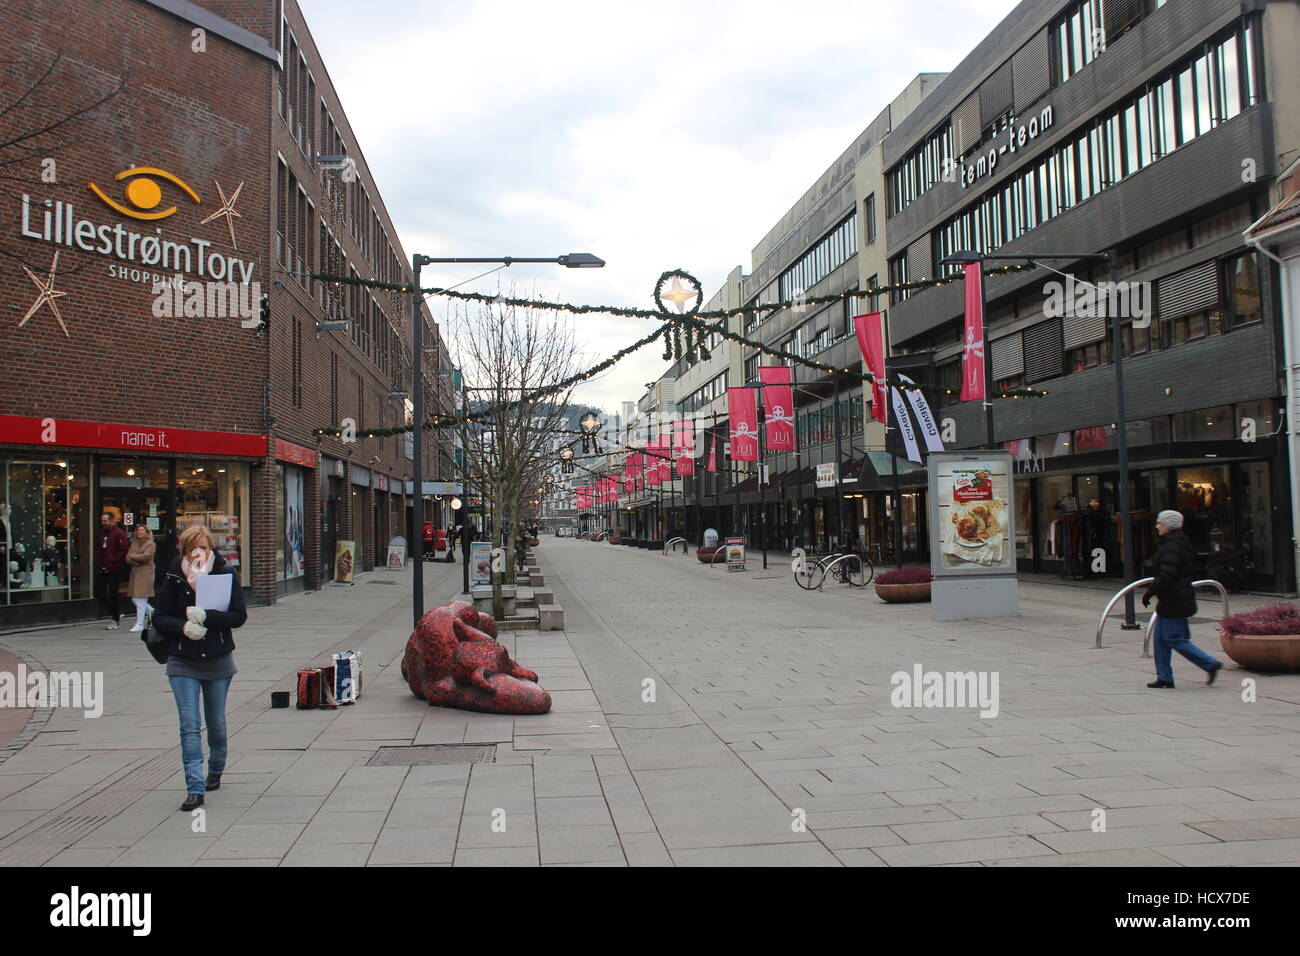 60e6d3e27 Lillestrøm city center in Norway during the Christmas season Stock ...